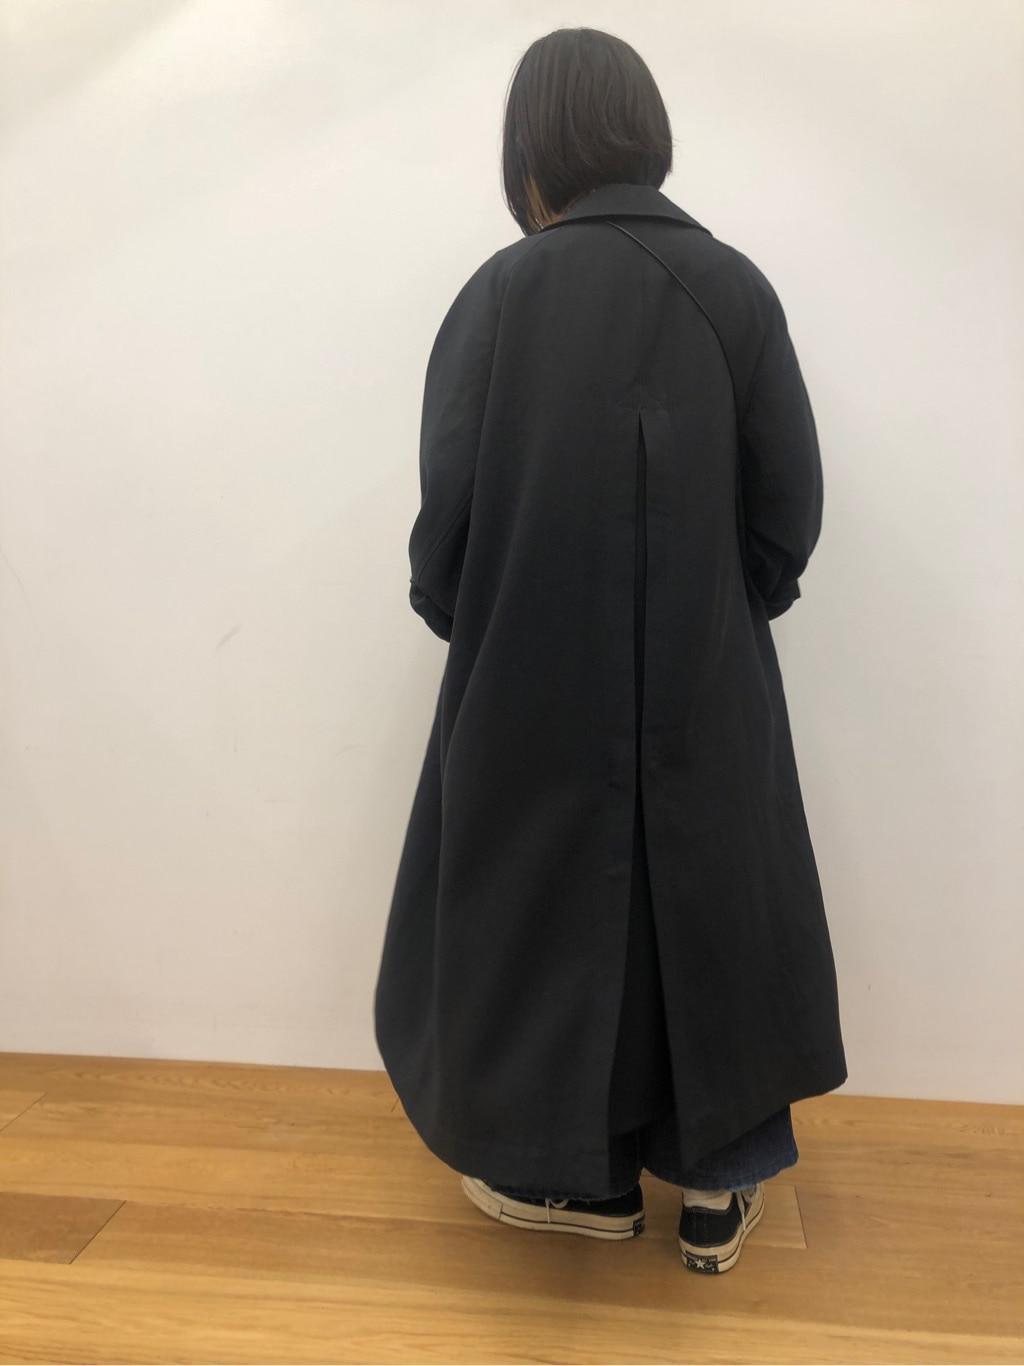 AMBIDEX アトリエ 身長:150cm 2020.10.09